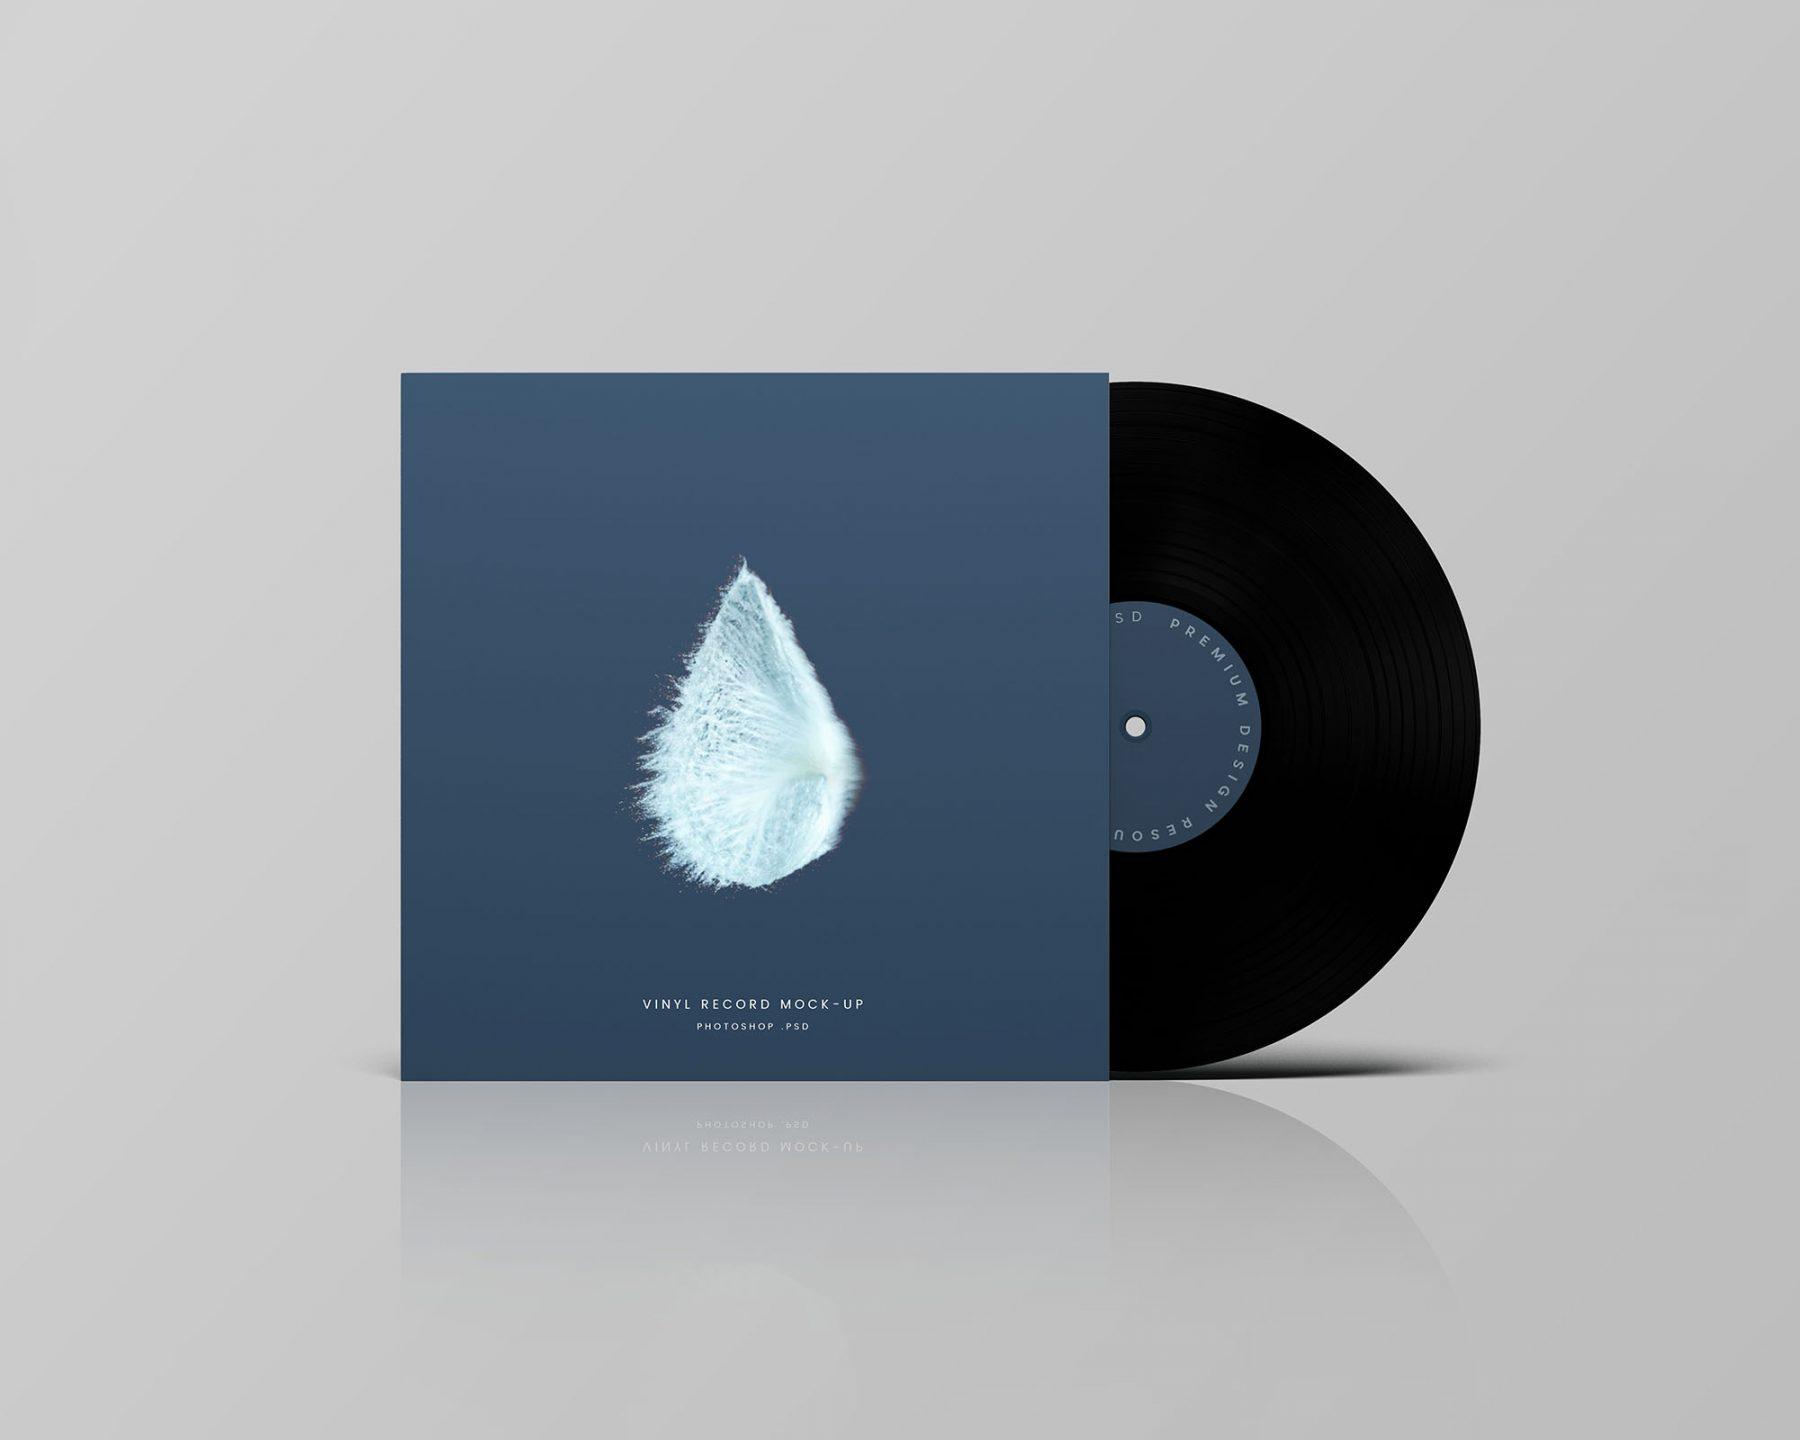 Free Vinyl Record Mockup